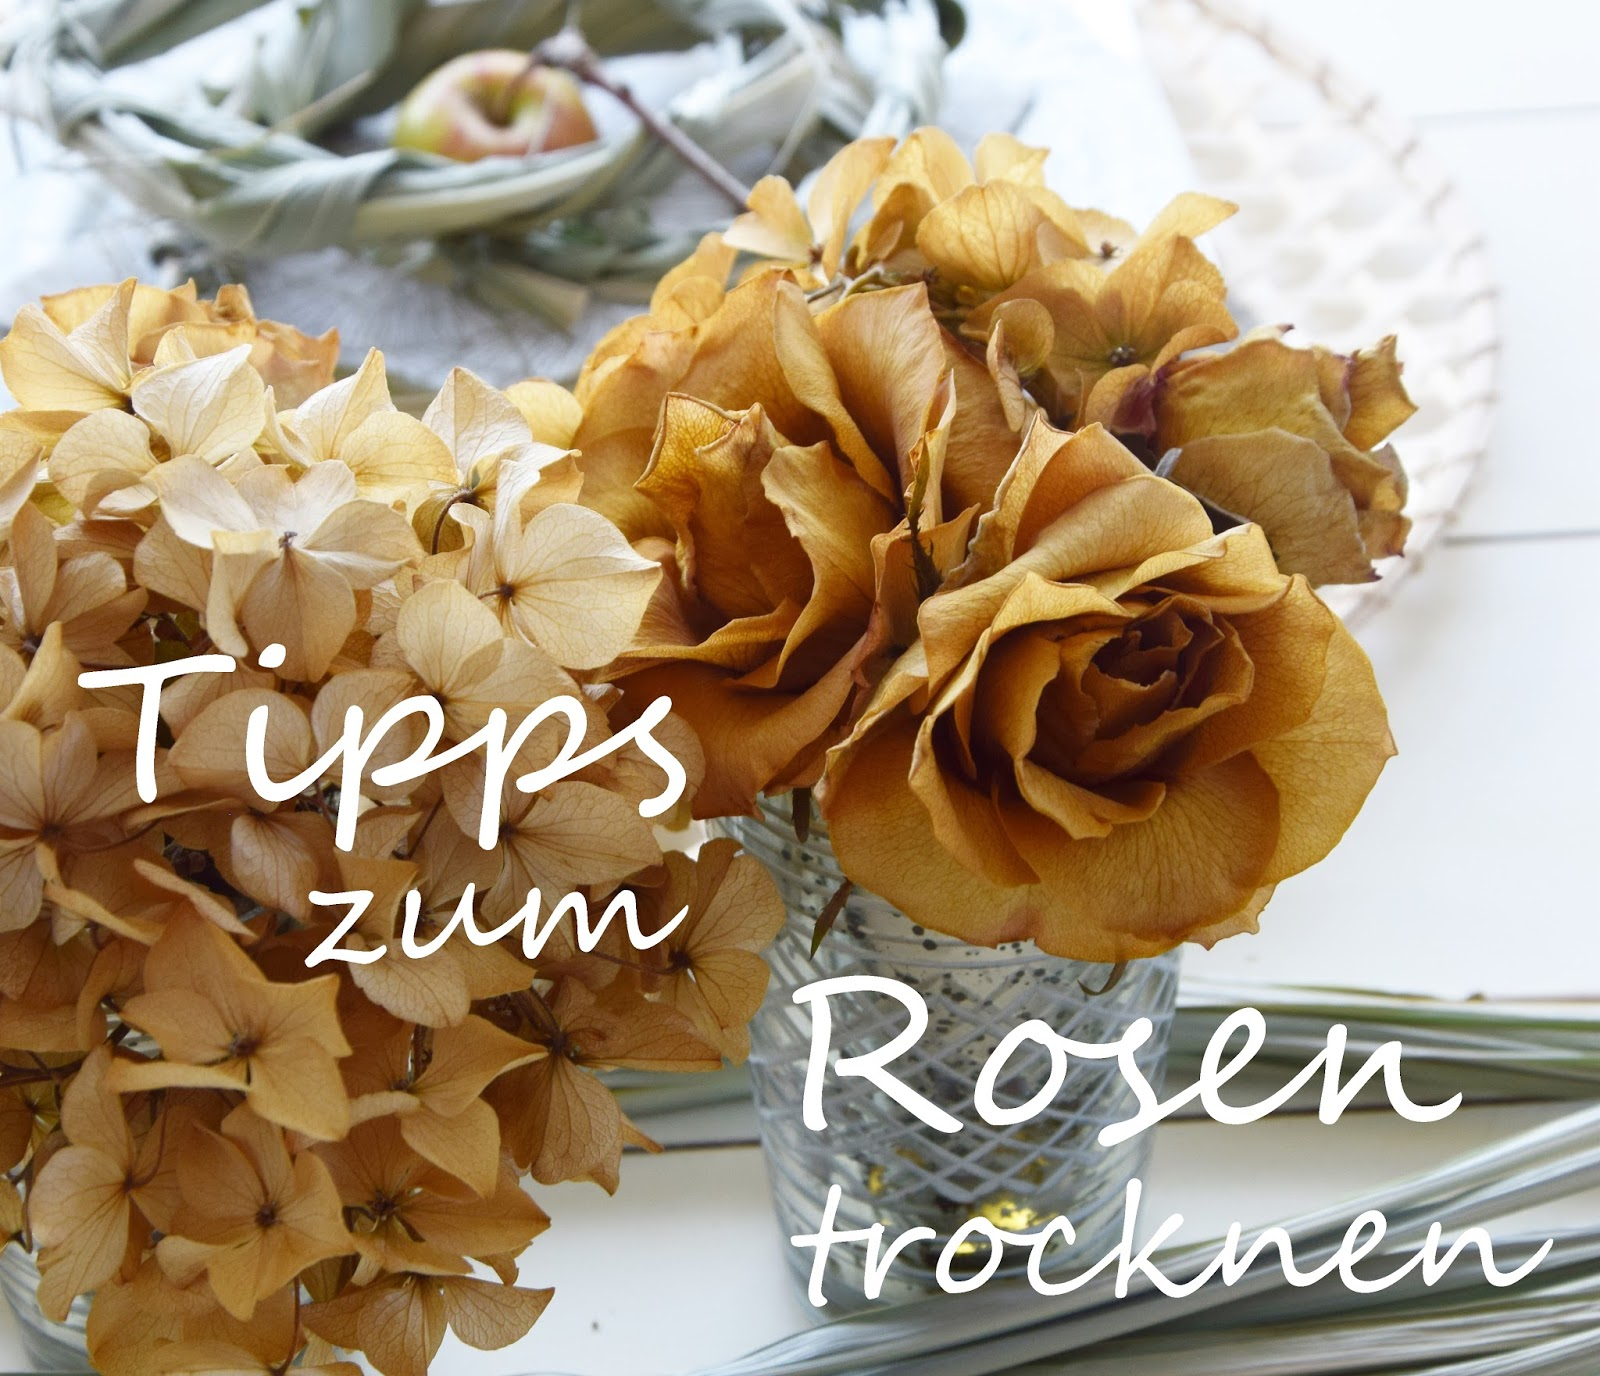 rosen seidig weich trocknen konservieren tipps tricks rose trocknung